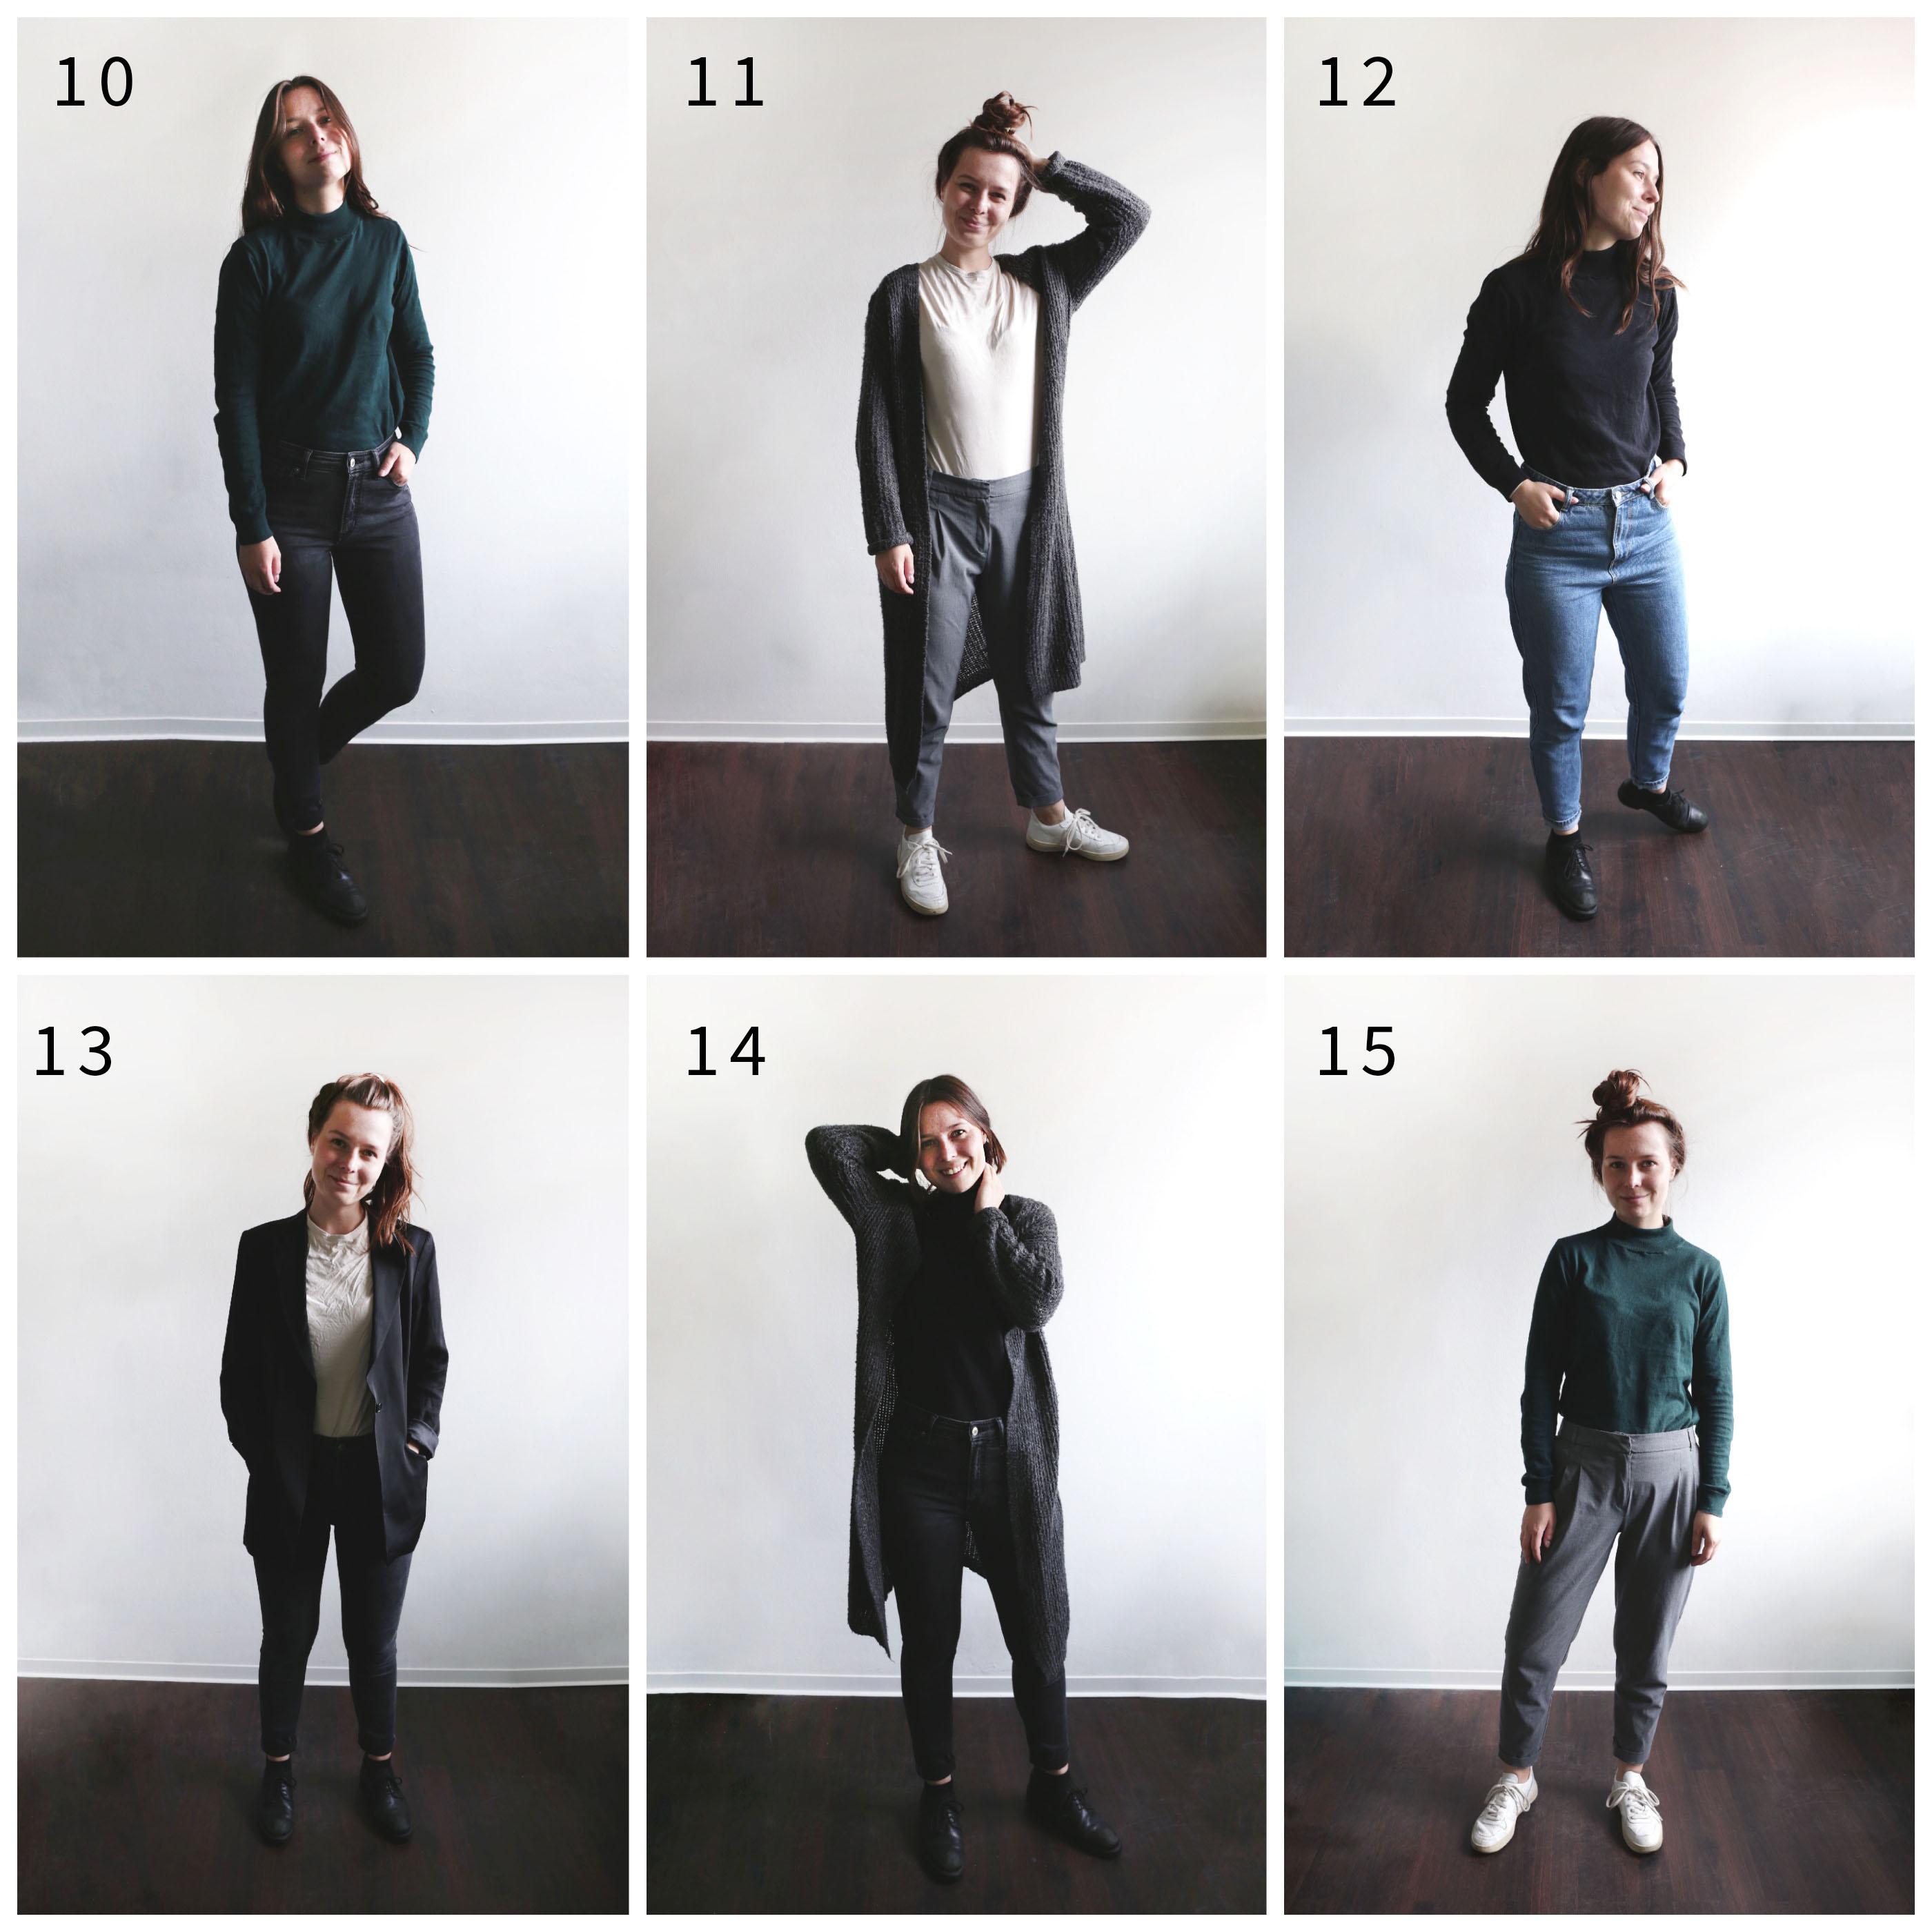 Capsule Wardrobe Herbst: 15 Teile - 15 Outfits